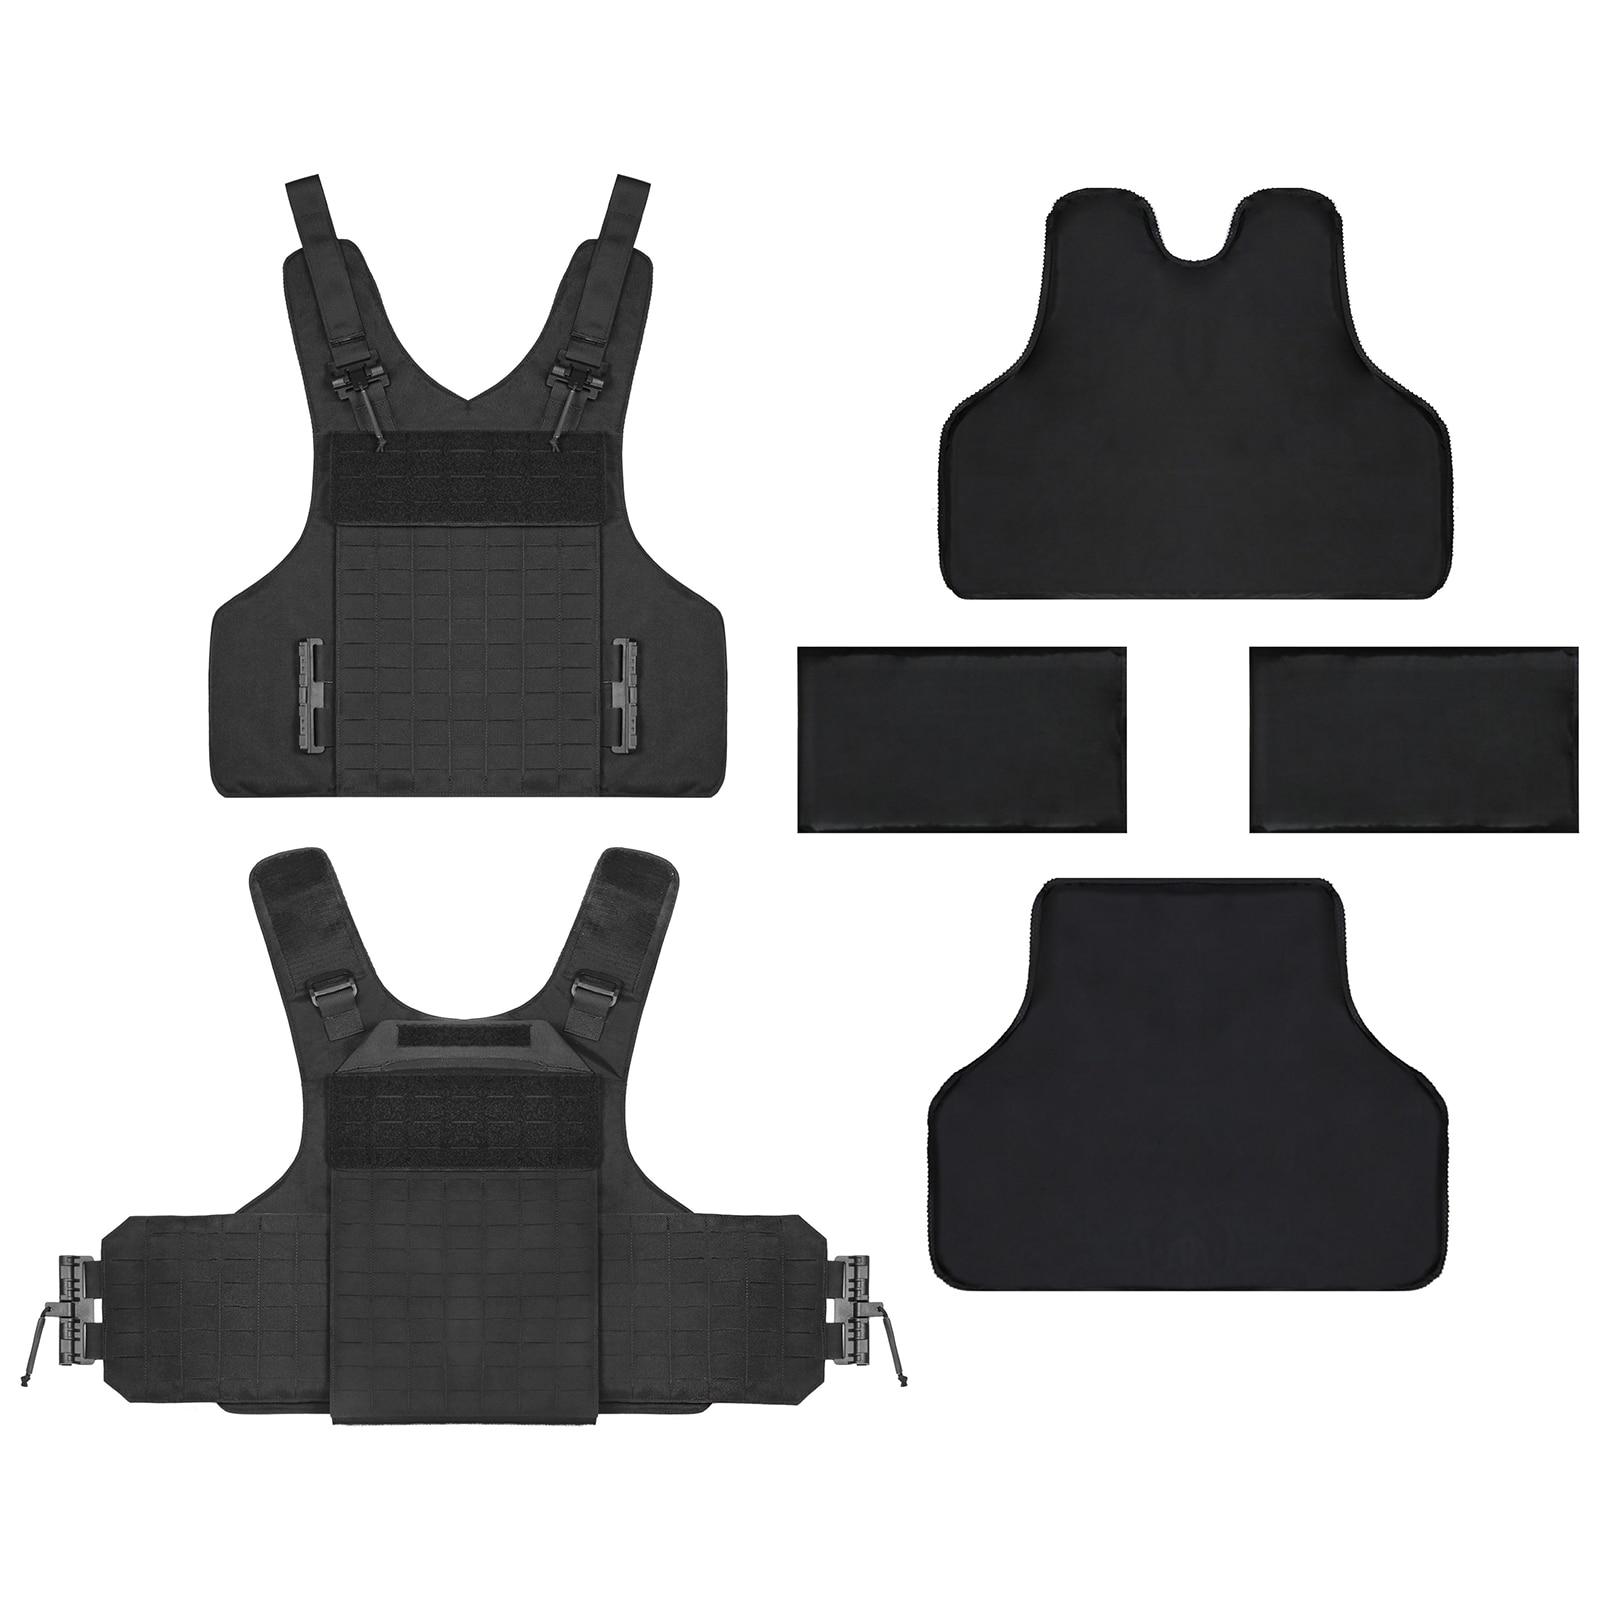 Buffalo Outdoor Wearproof Tactical Vest Anti-stab Tactical Gear Set - Black